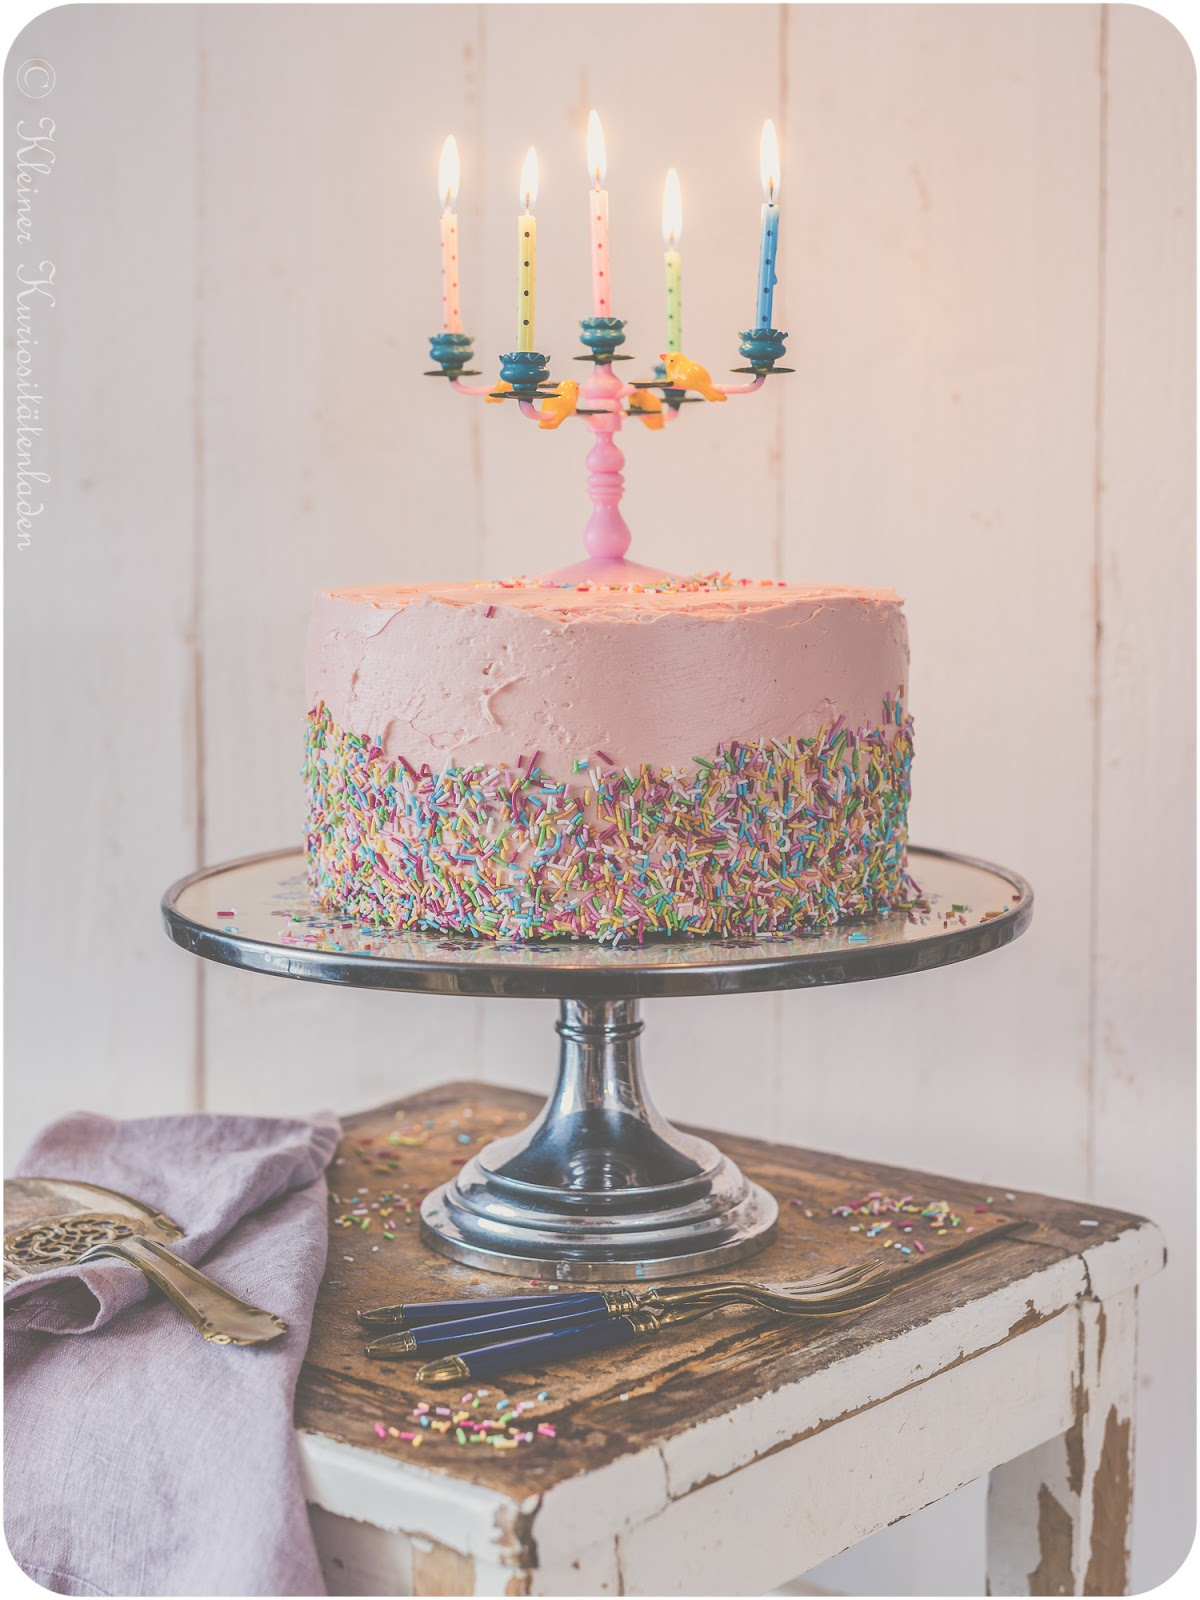 Funfetti Cake zum 10. Bloggeburtstag